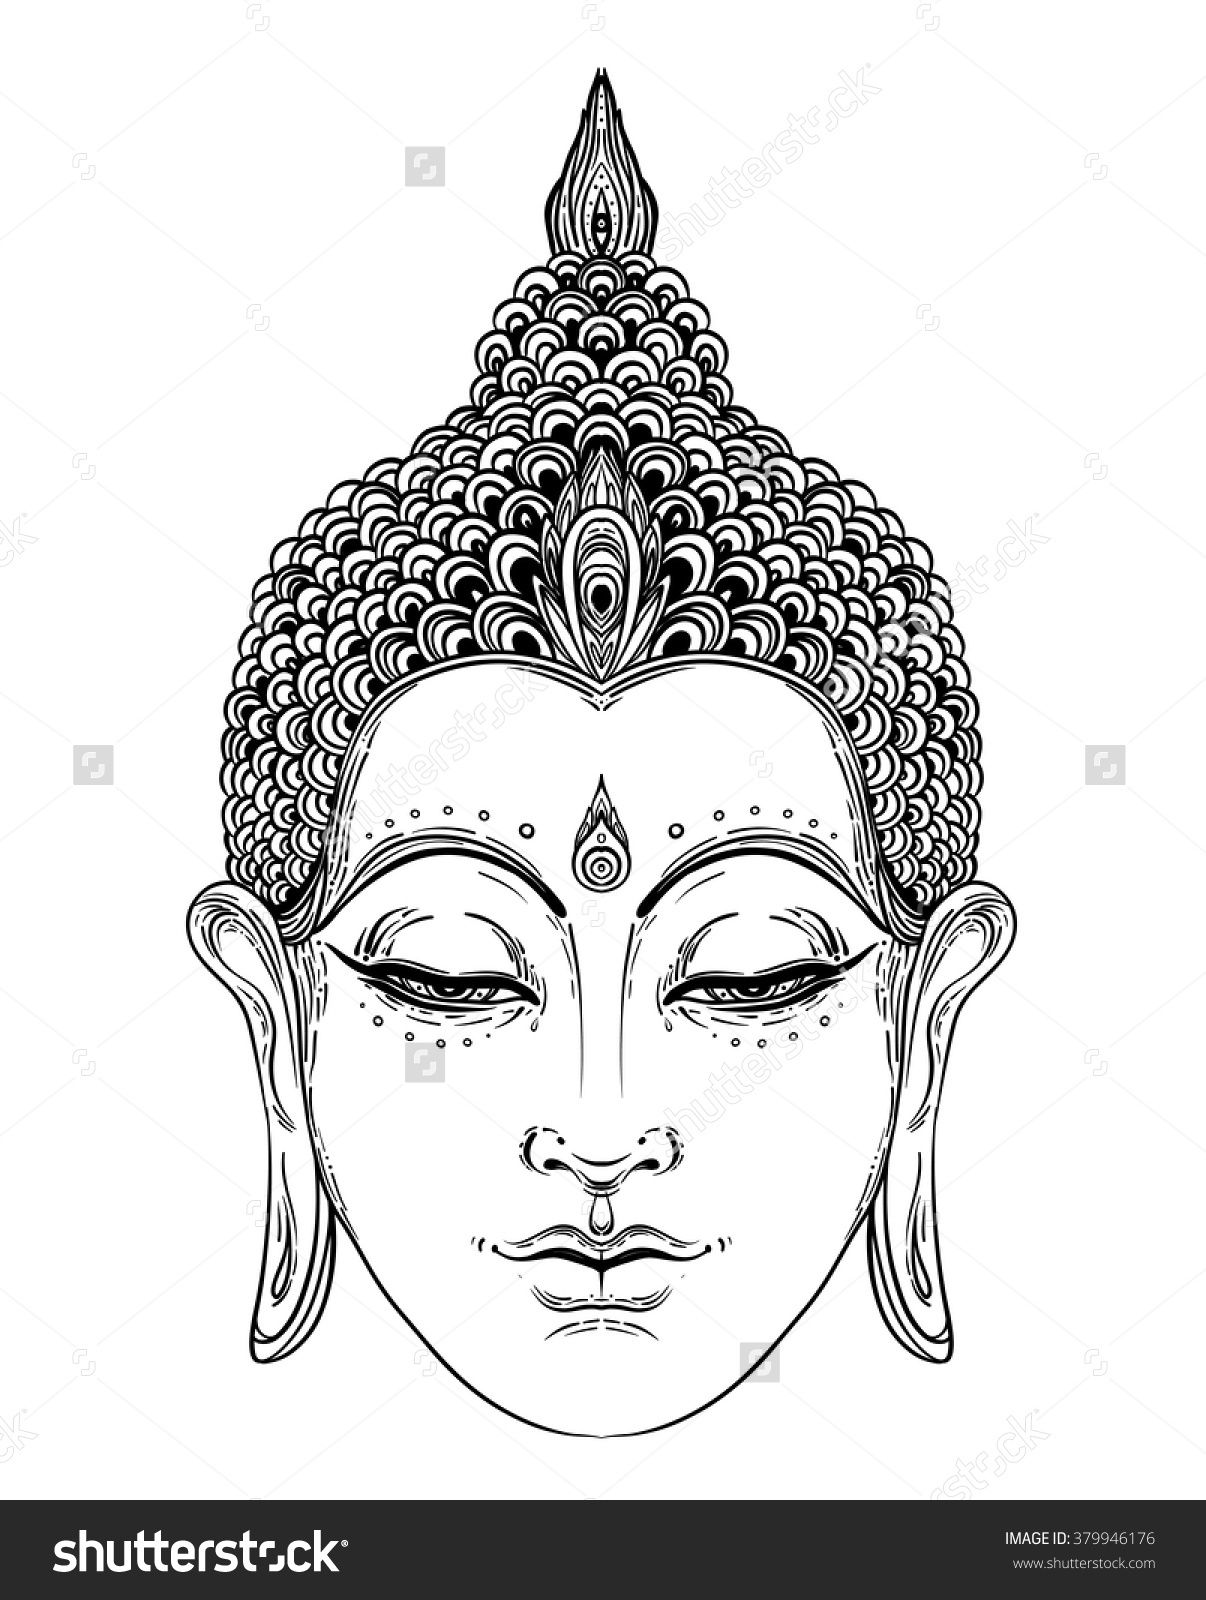 Malvorlage Buddha Ausmalbild